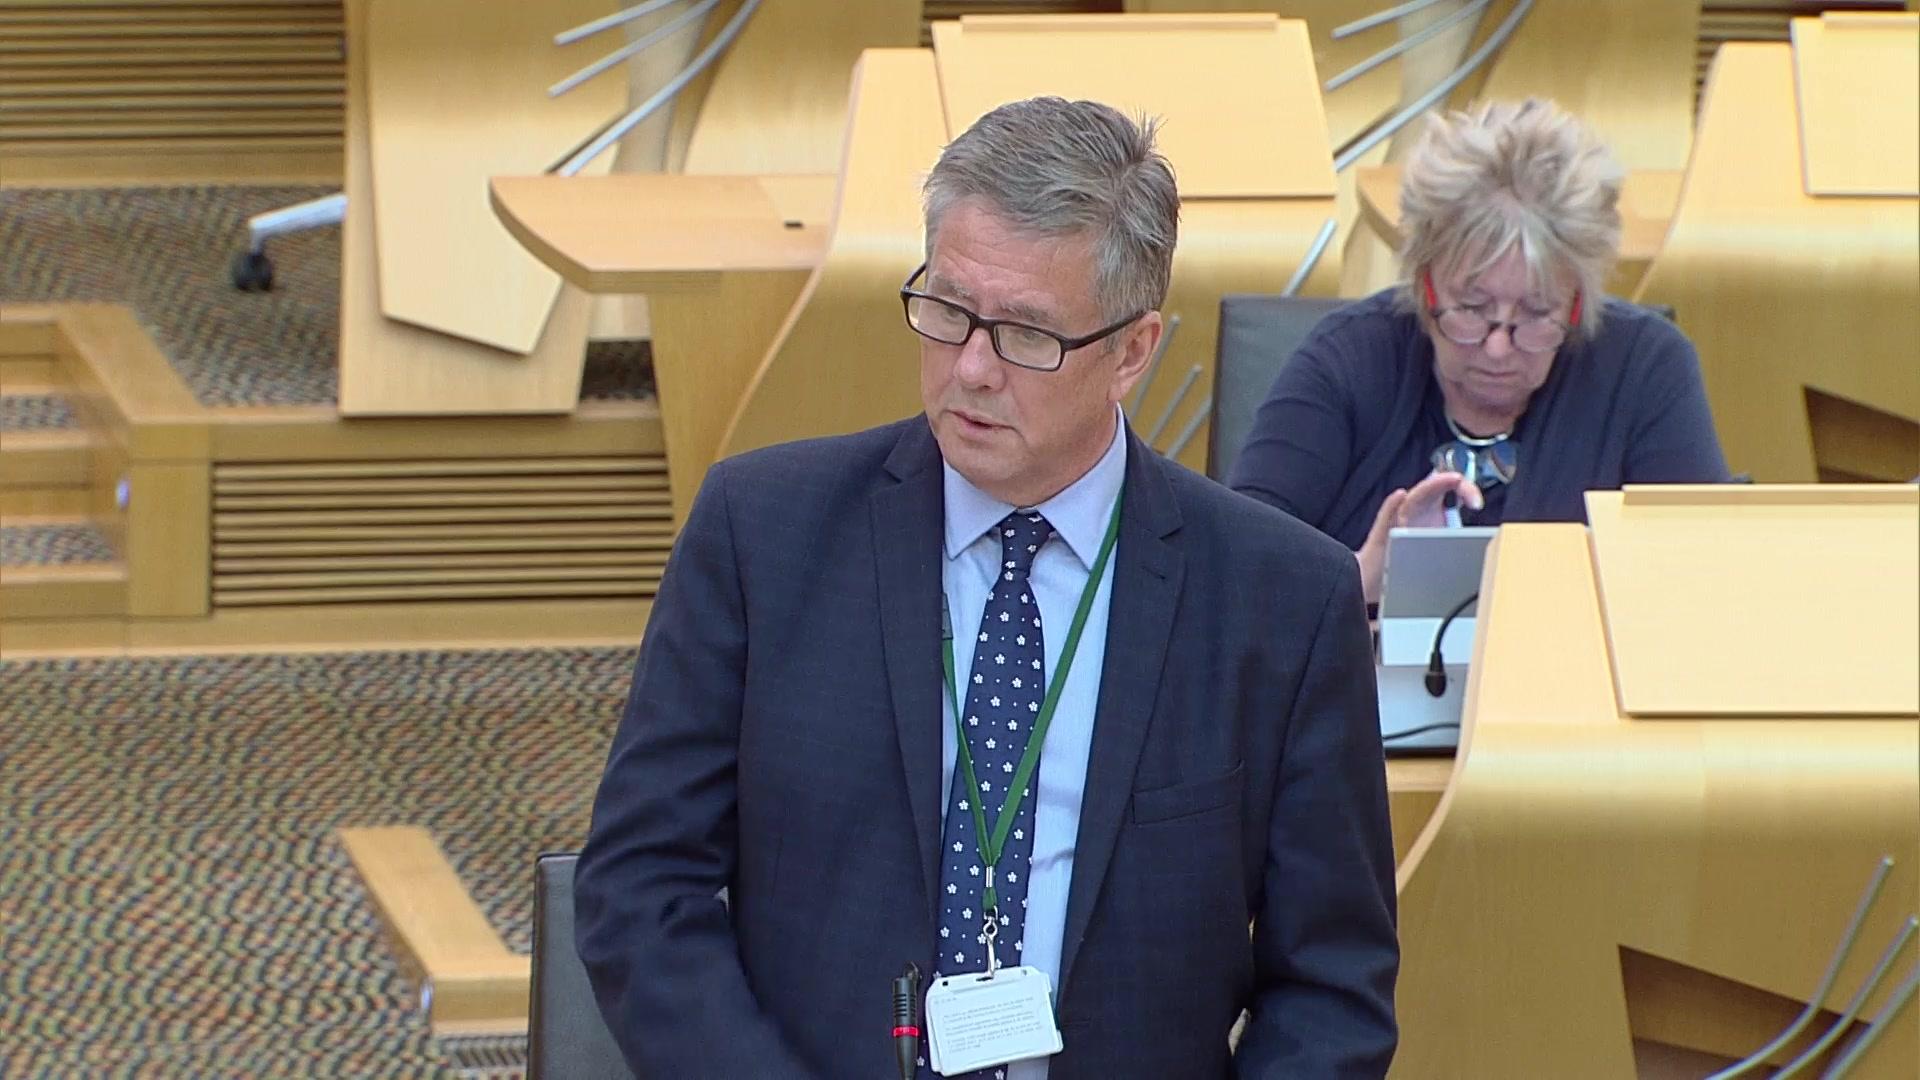 Scottish Government Debate: Justice: Recover, Renew, Transform